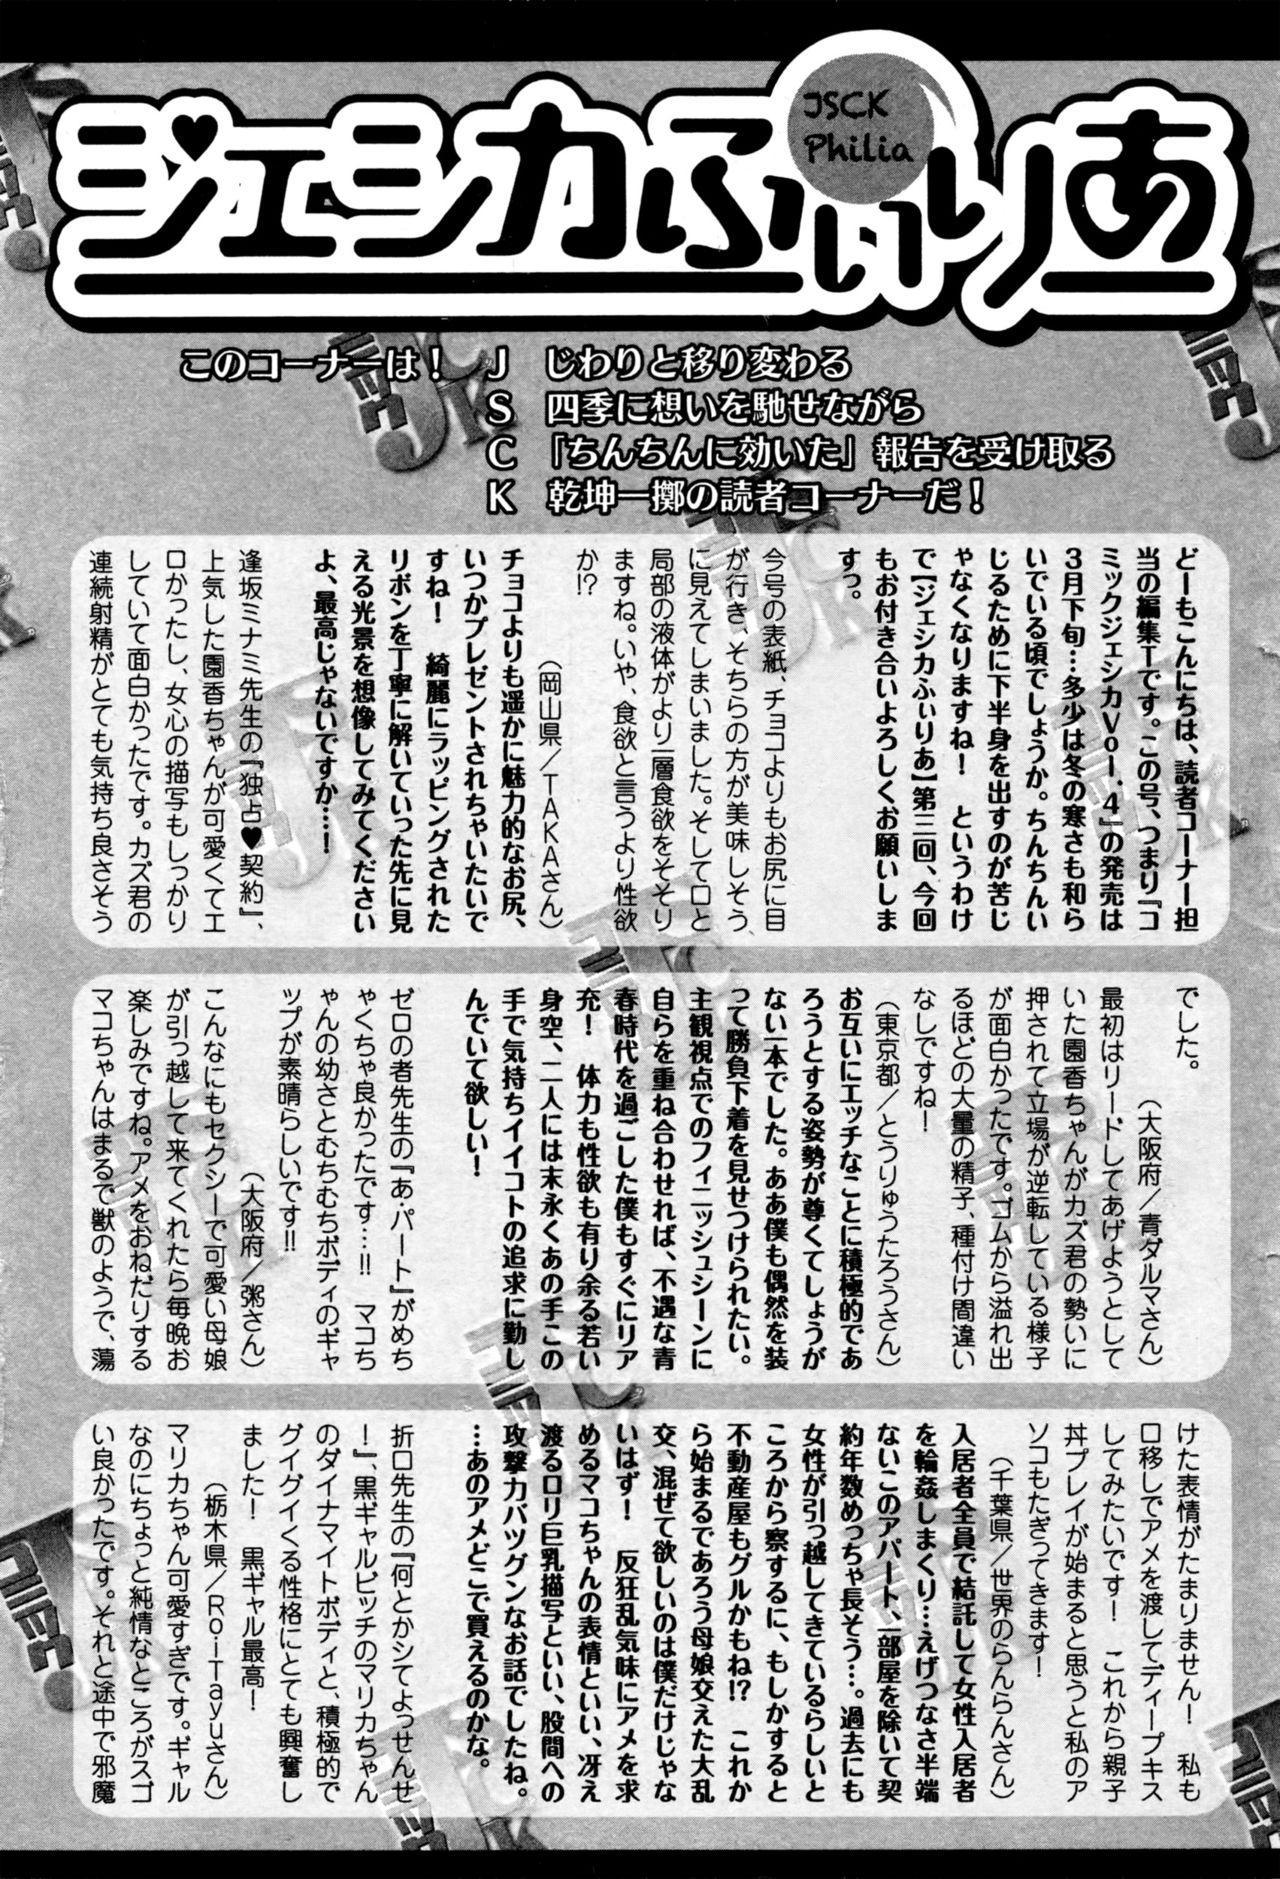 Comic JSCK Vol.4 2016-05 276